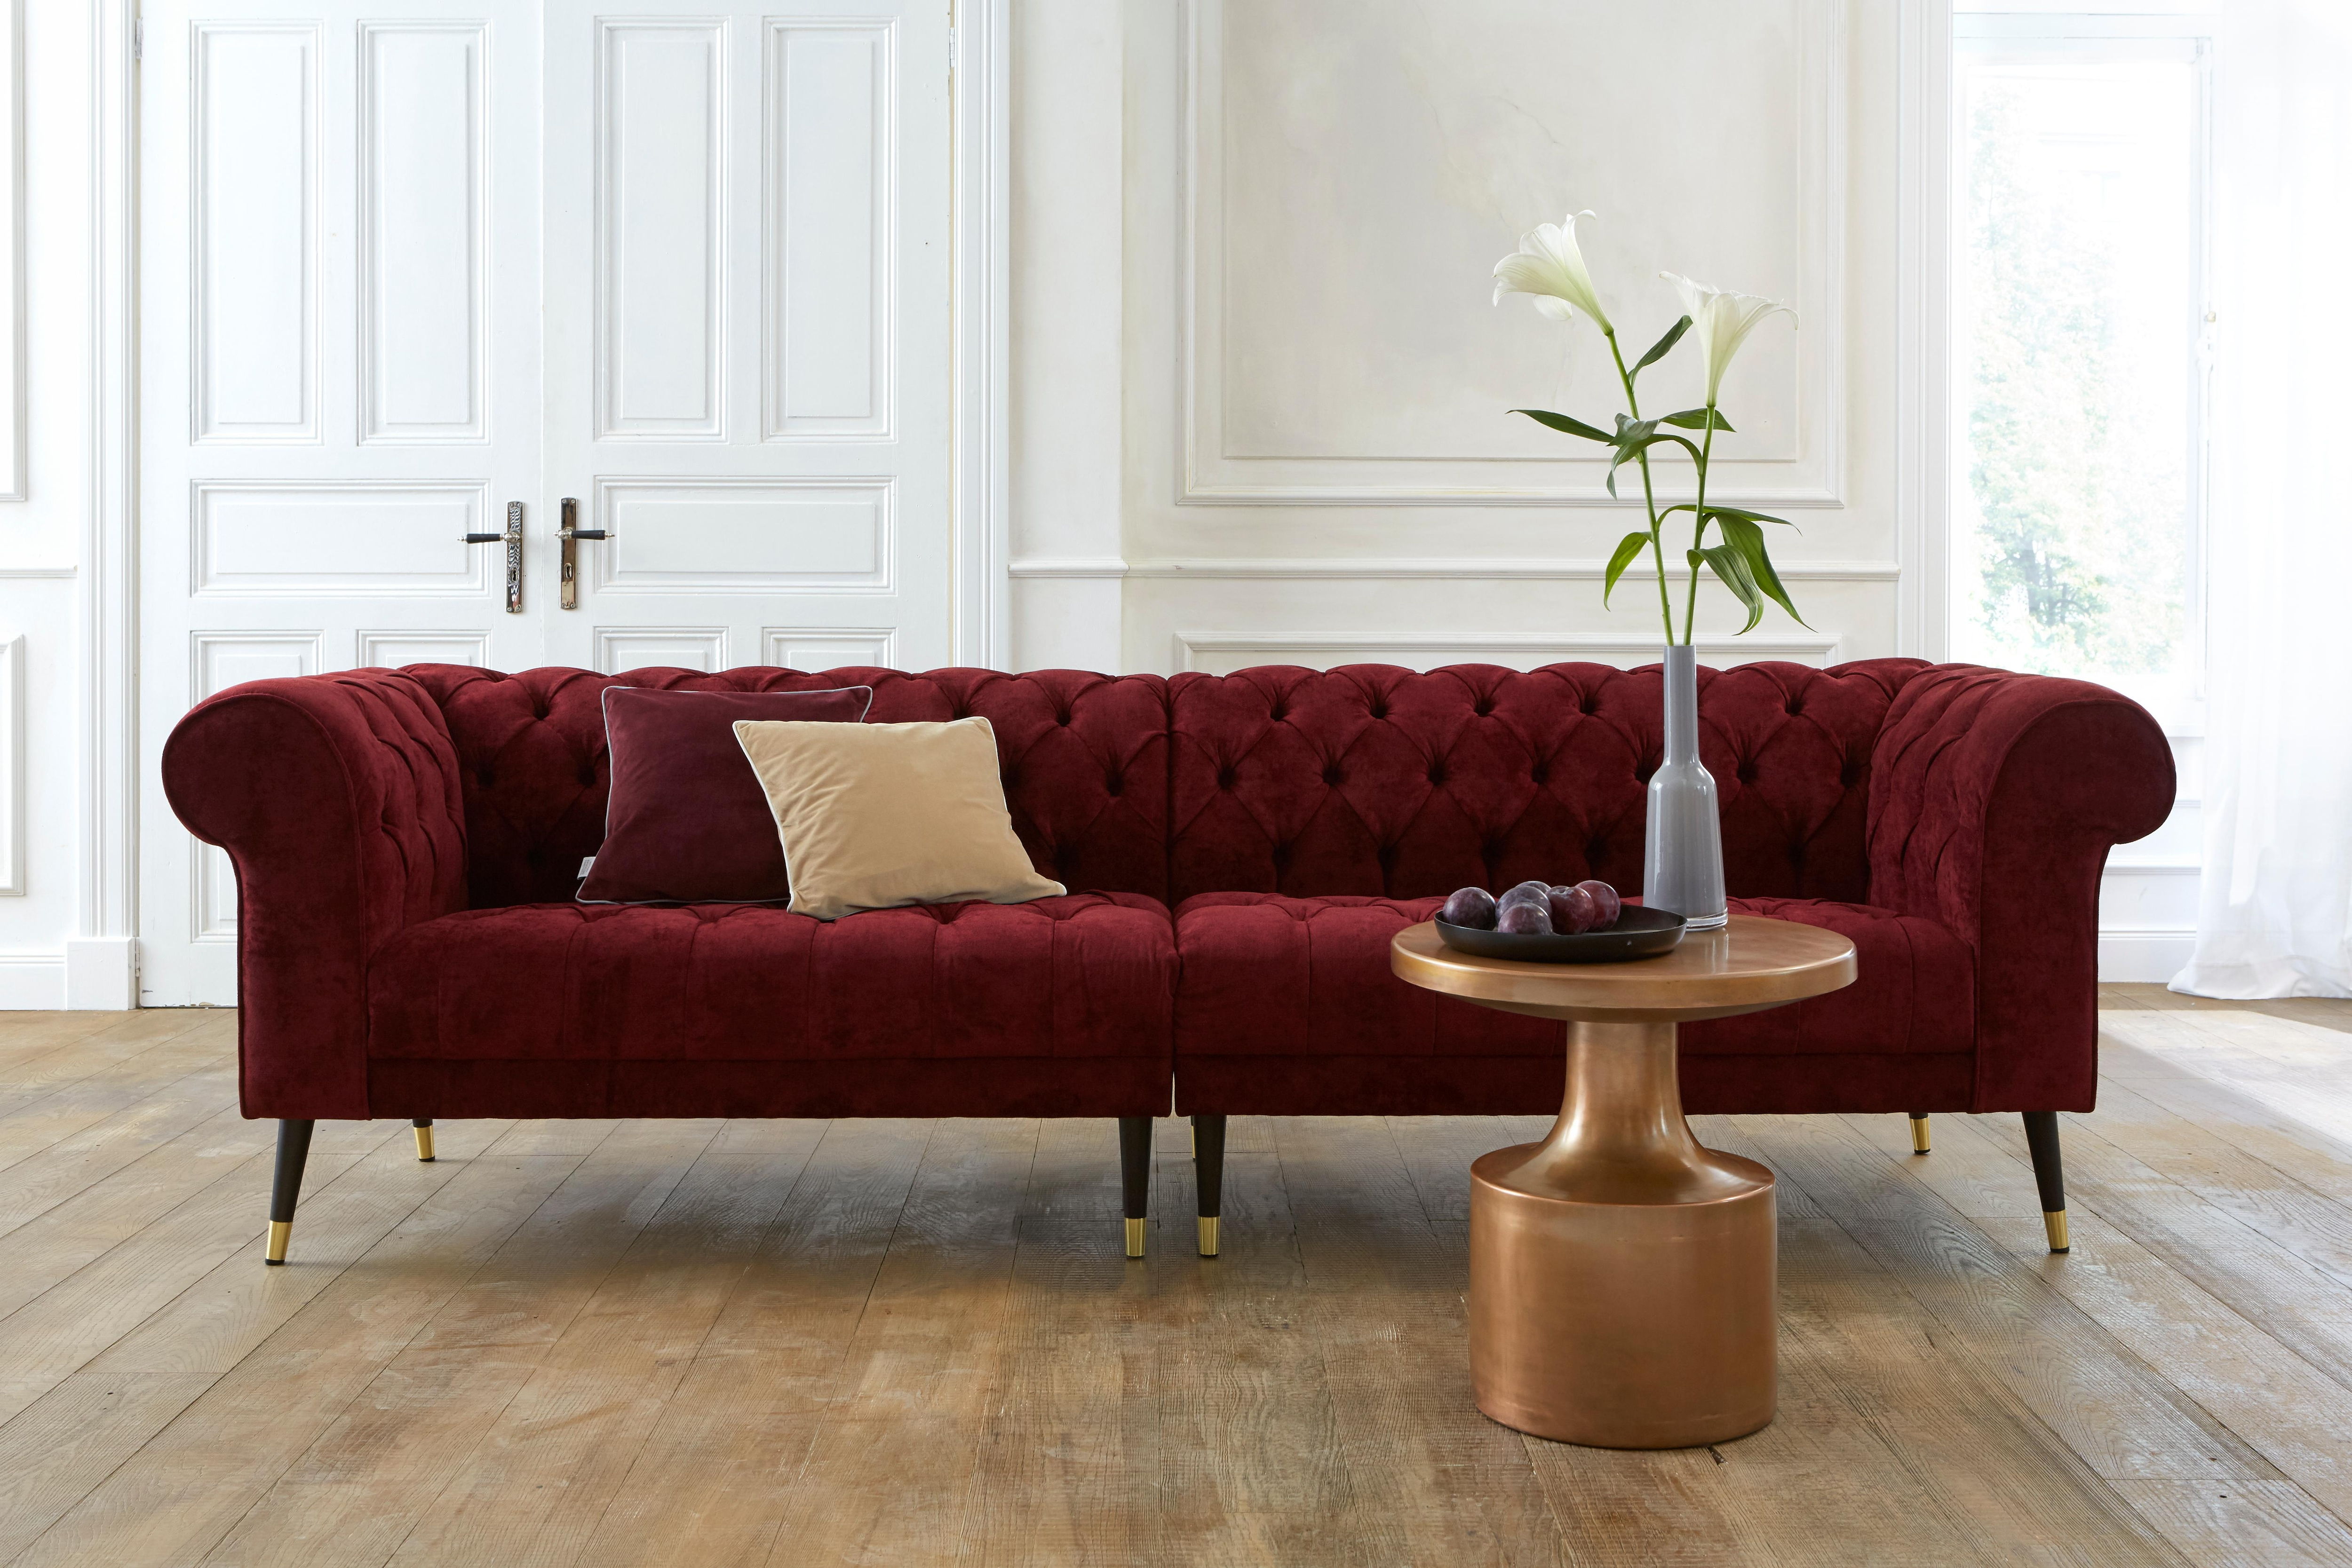 GMK Home & Living Chesterfield Big-Sofa »Tinnum« | Wohnzimmer > Sofas & Couches > Chesterfield Sofas | Kunststoff - Microfaser | GUIDO MARIA KRETSCHMER HOME & LIVING